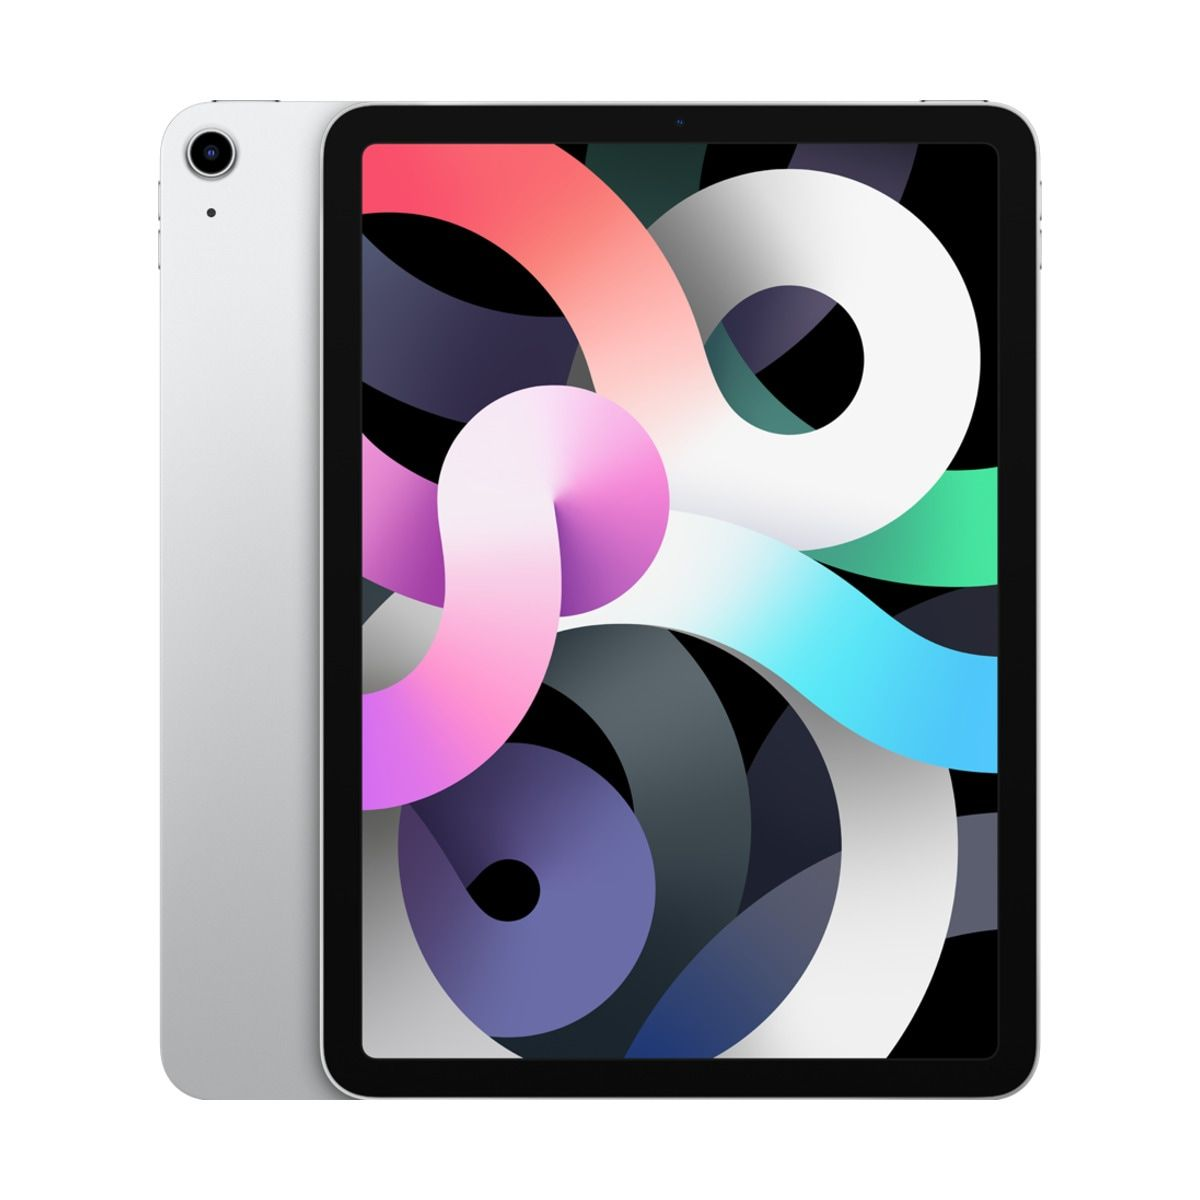 Apple iPad Air Wi-Fi+Cell 256GB - Silver - MYH42FD/A